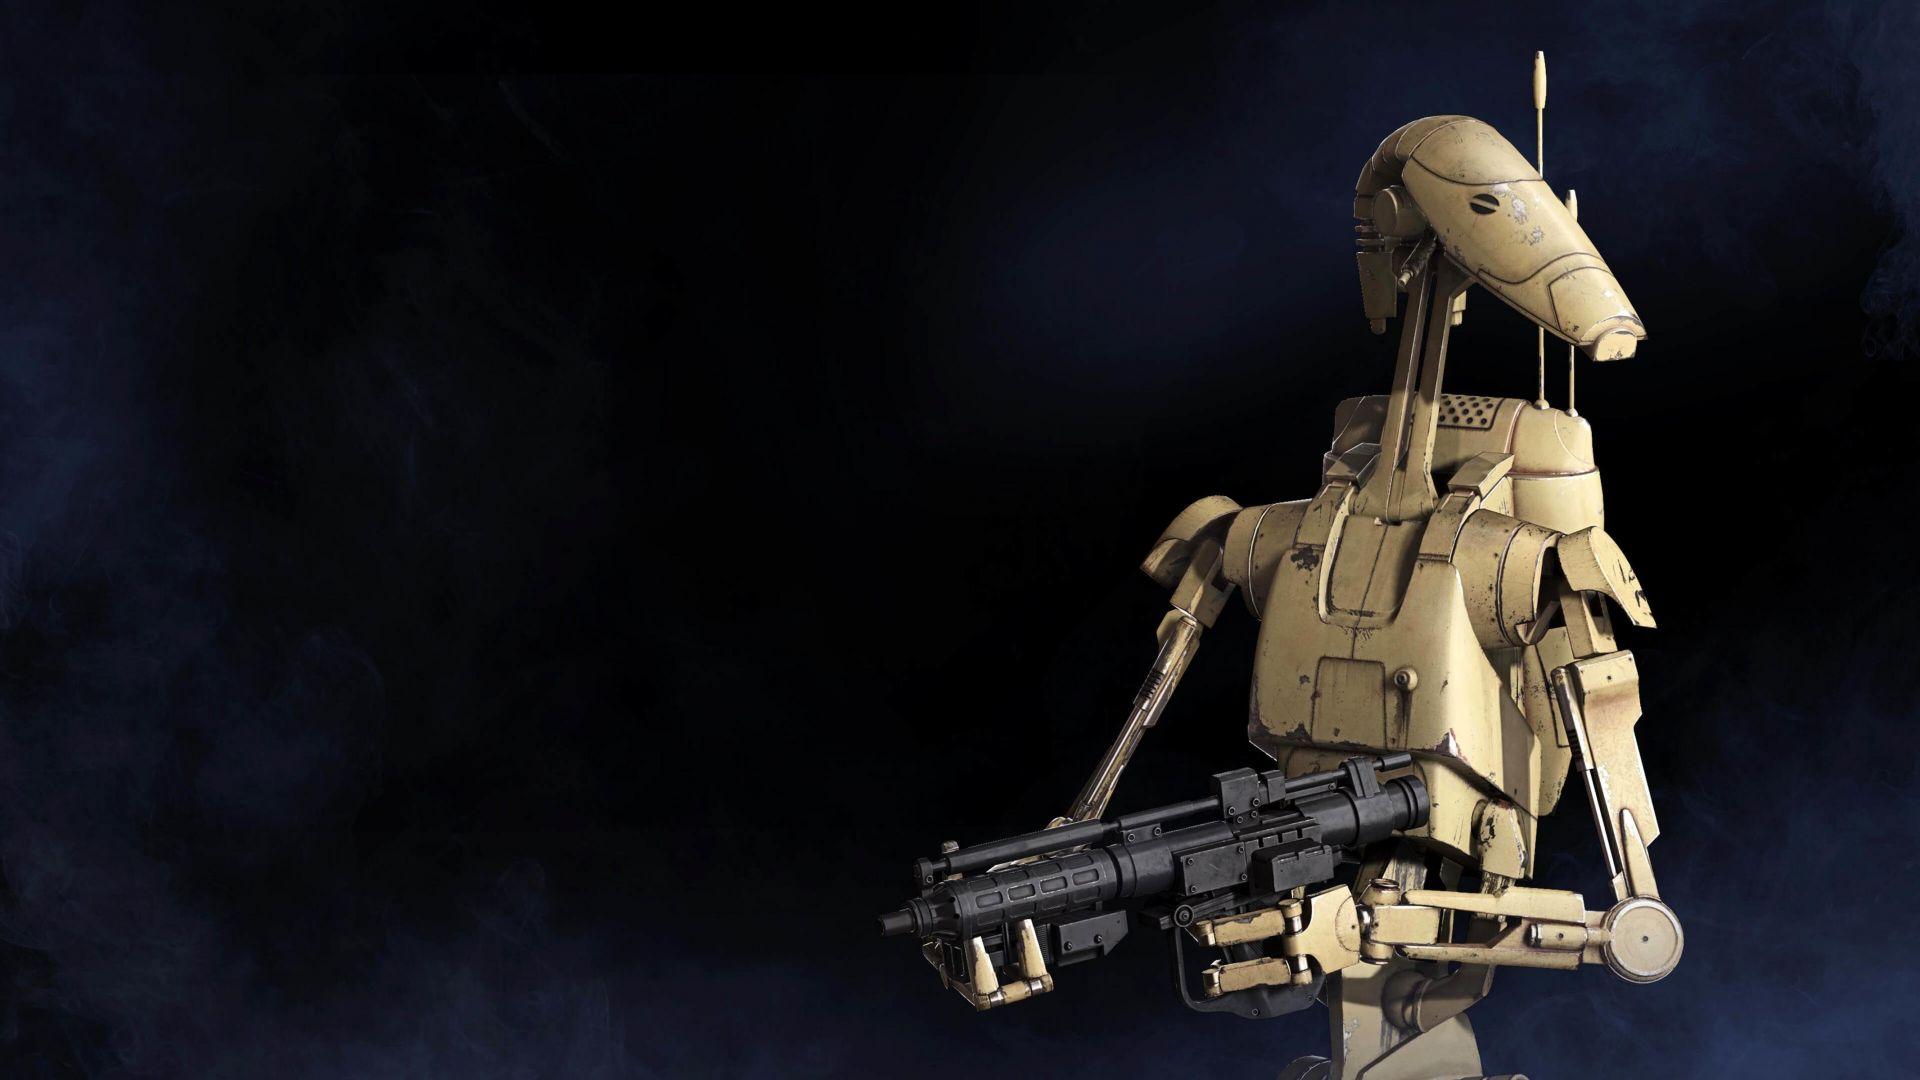 Star Wars Battle Droid 3D Desktop HD Wallpaper